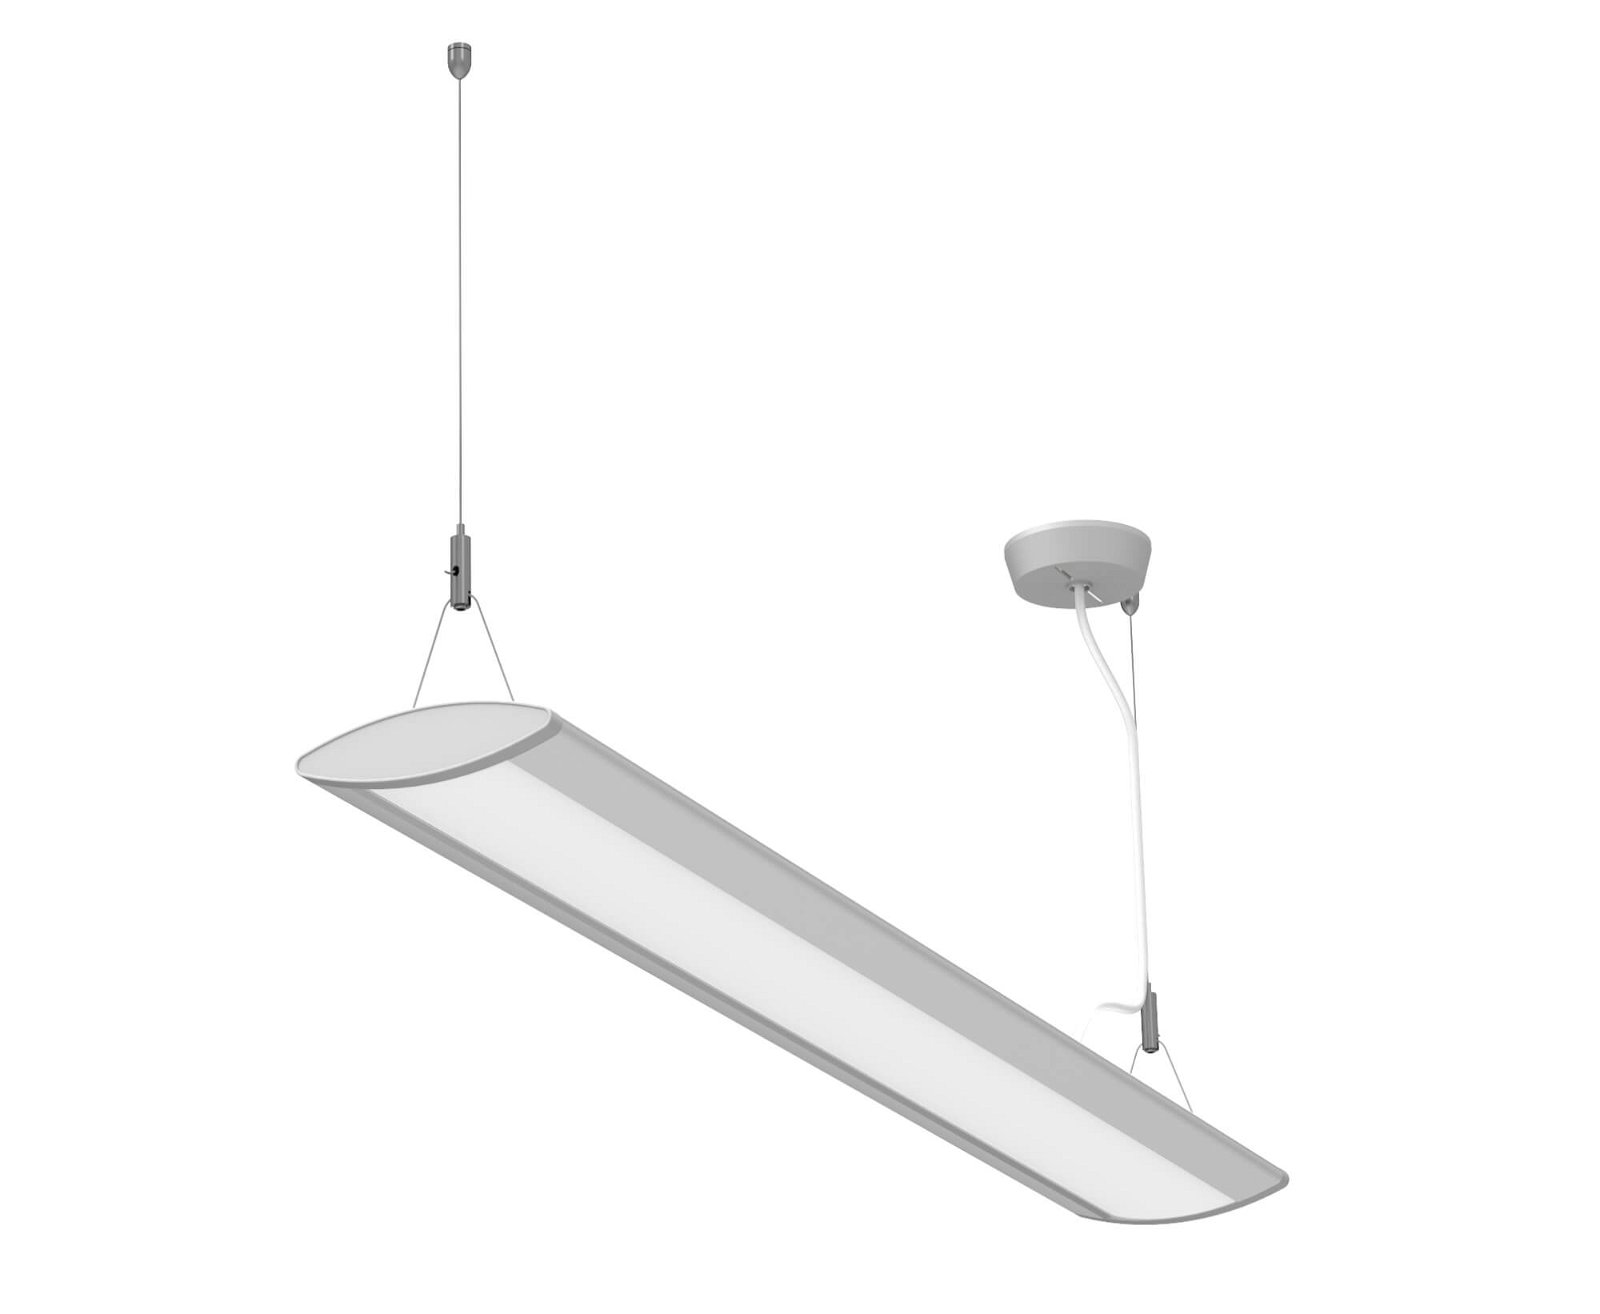 LED-Pendelleuchte MAULeye, 30 W, 94 cm, silber